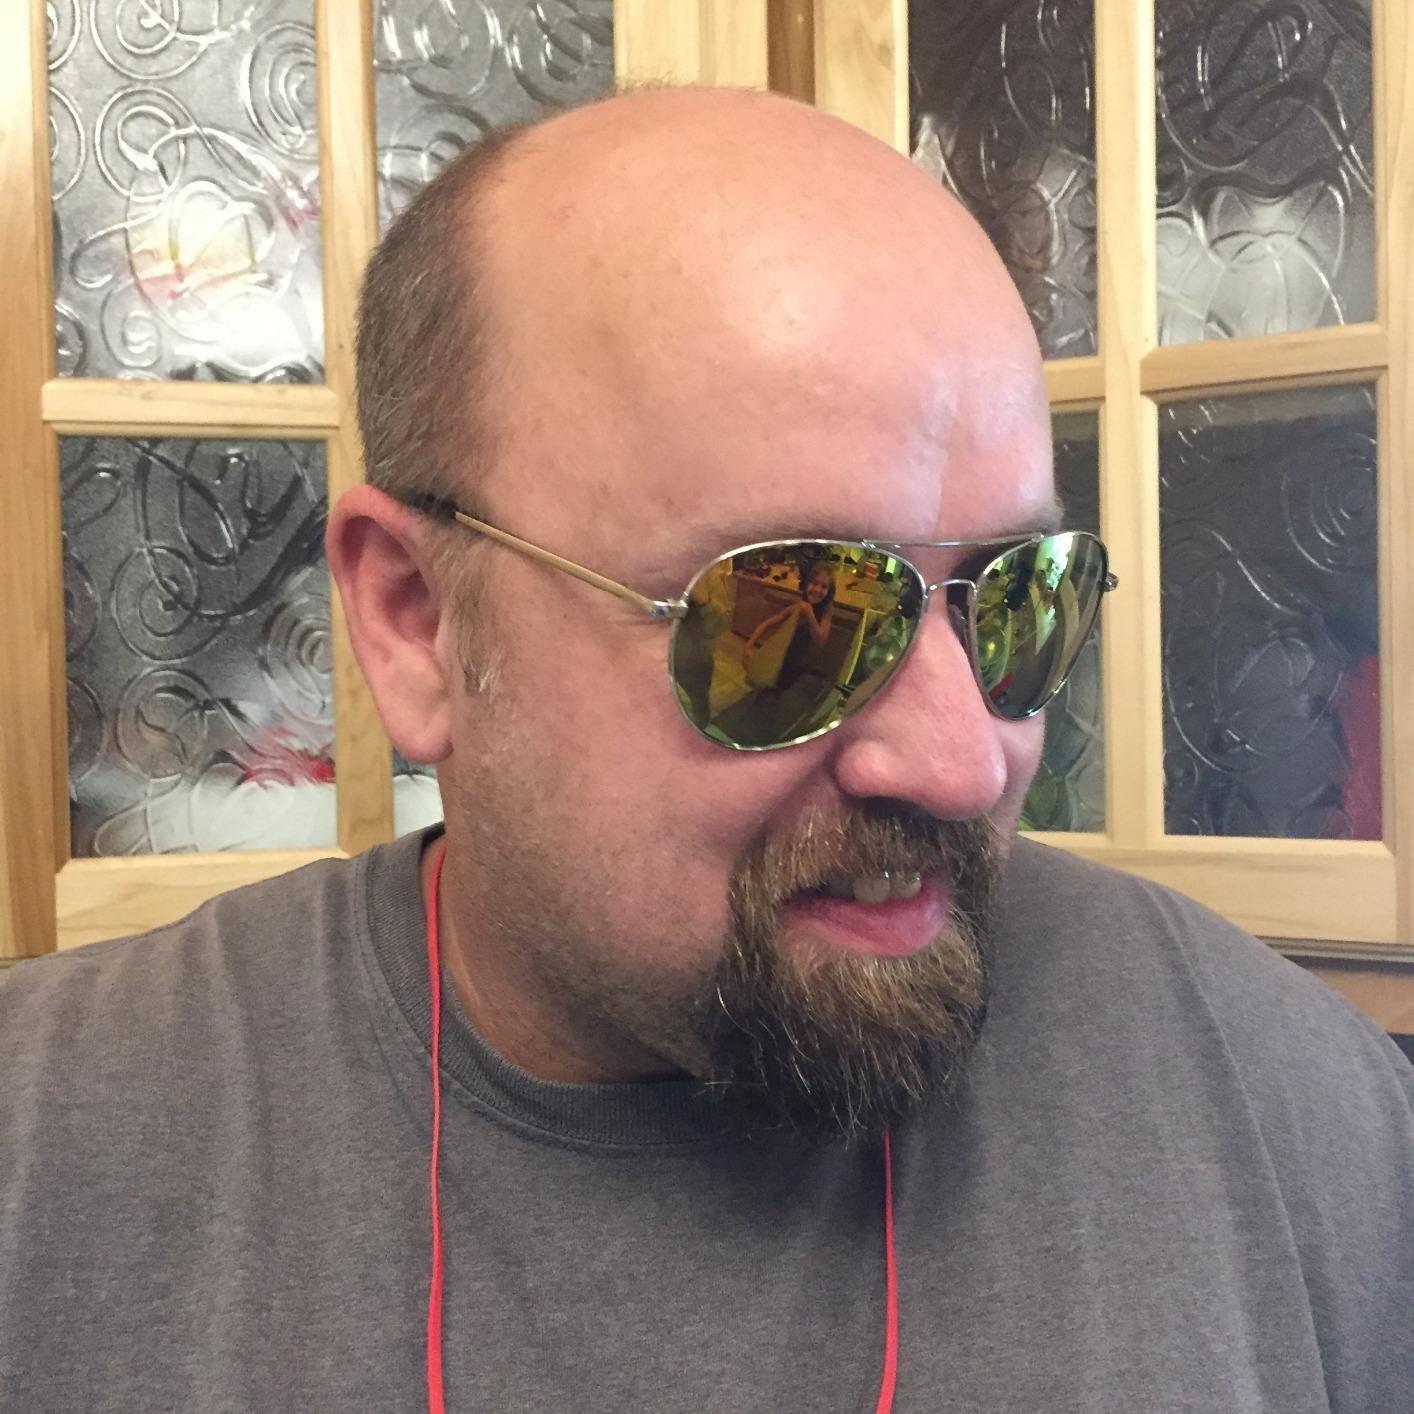 Amazon.com: Duduma Premium Full Mirrored Aviator Sunglasses w/ Flash Mirror Lens Uv400 (Black frame/smoke lens): Clothing